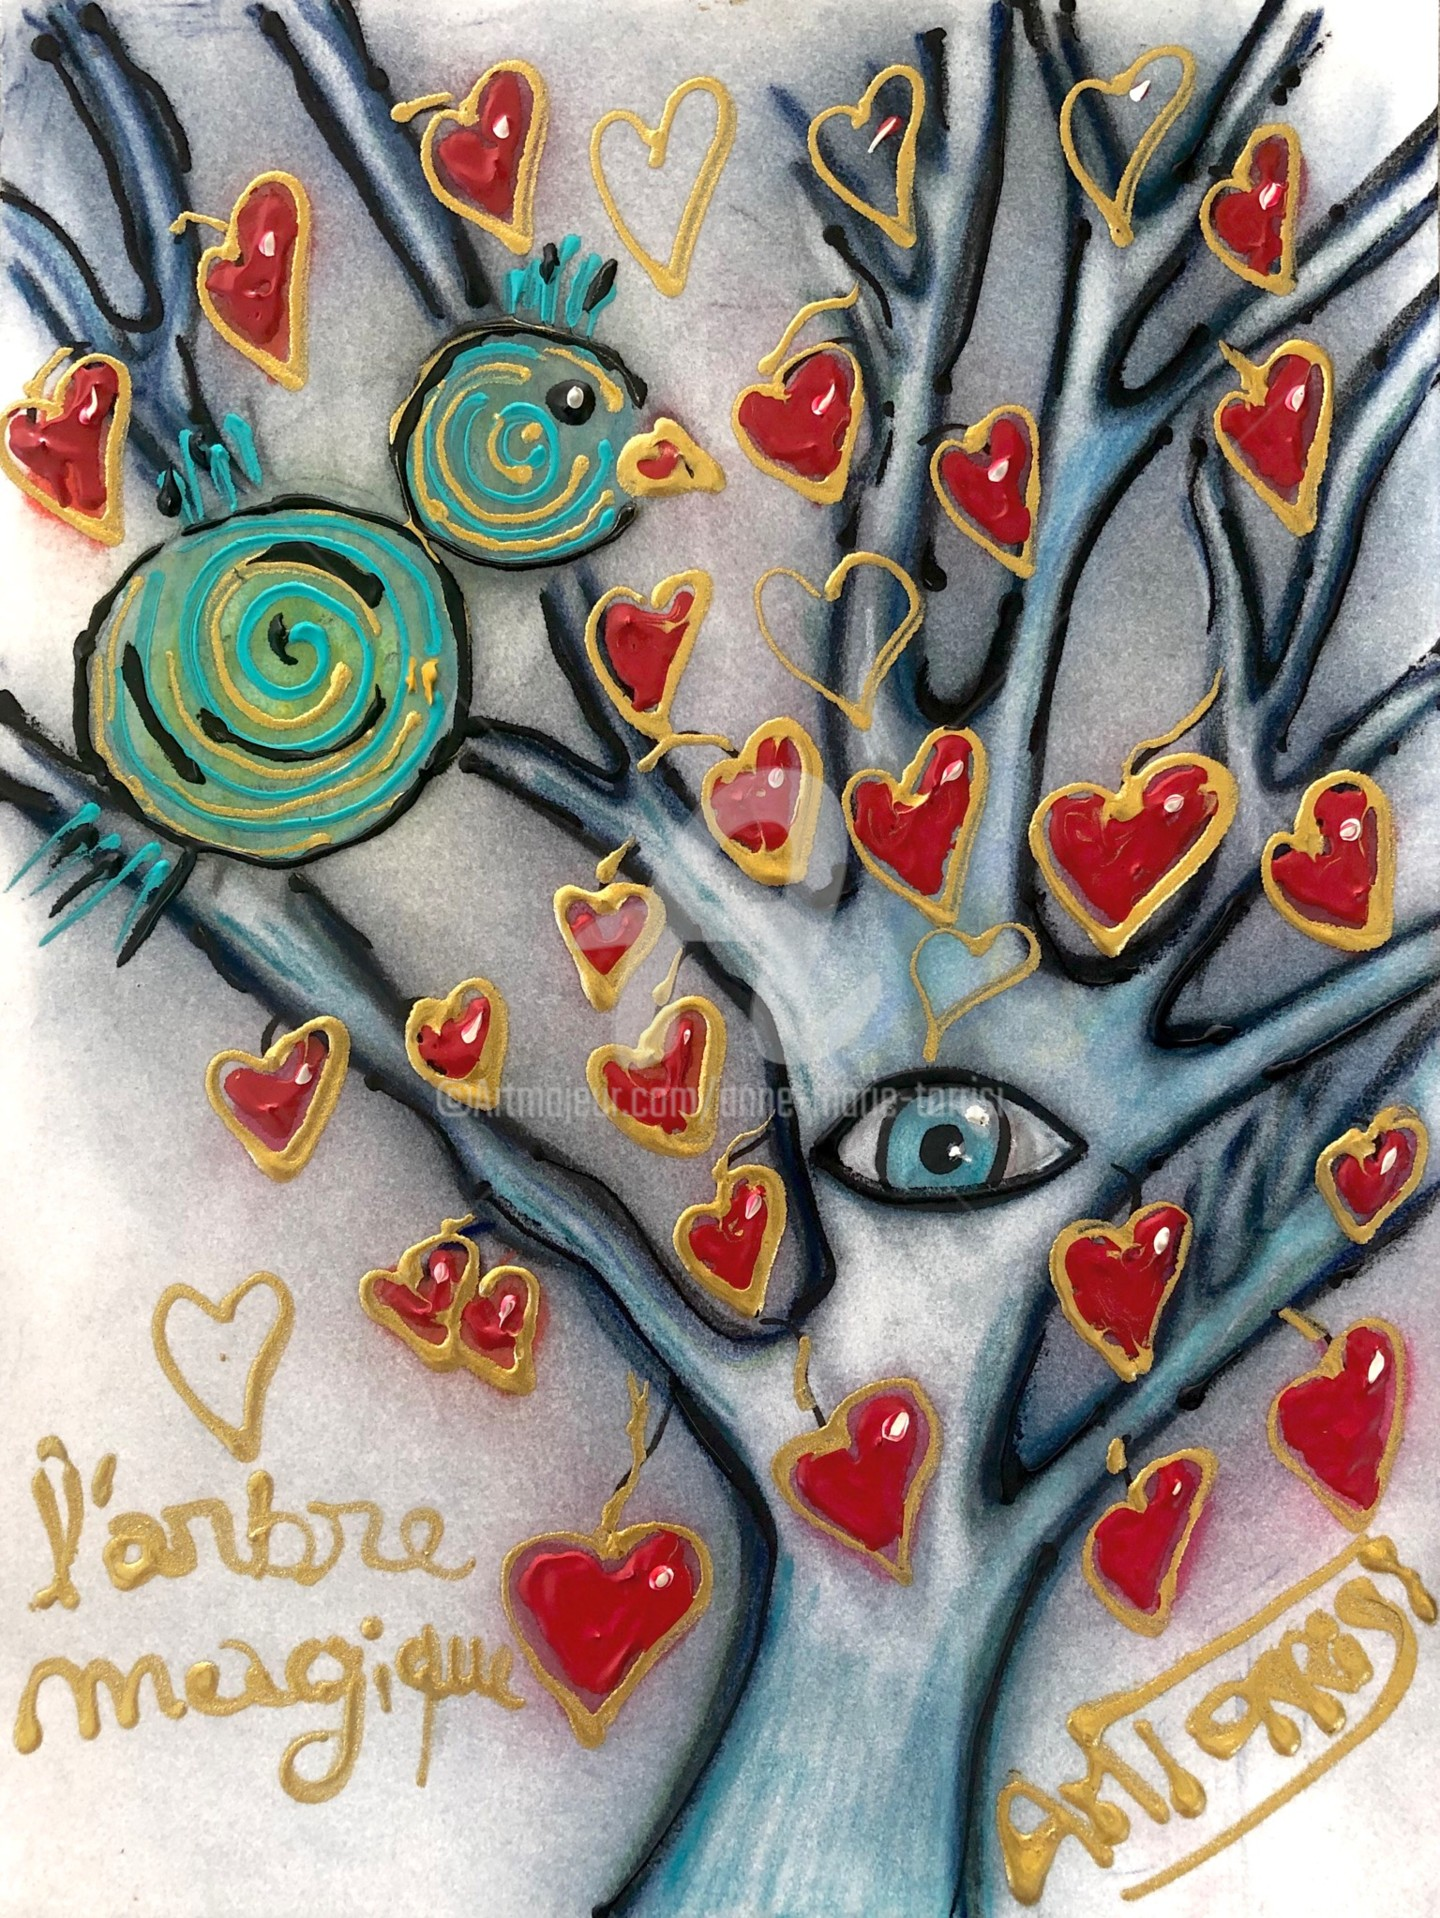 Anne Marie Torrisi - L'ARBRE MAGIQUE dessin